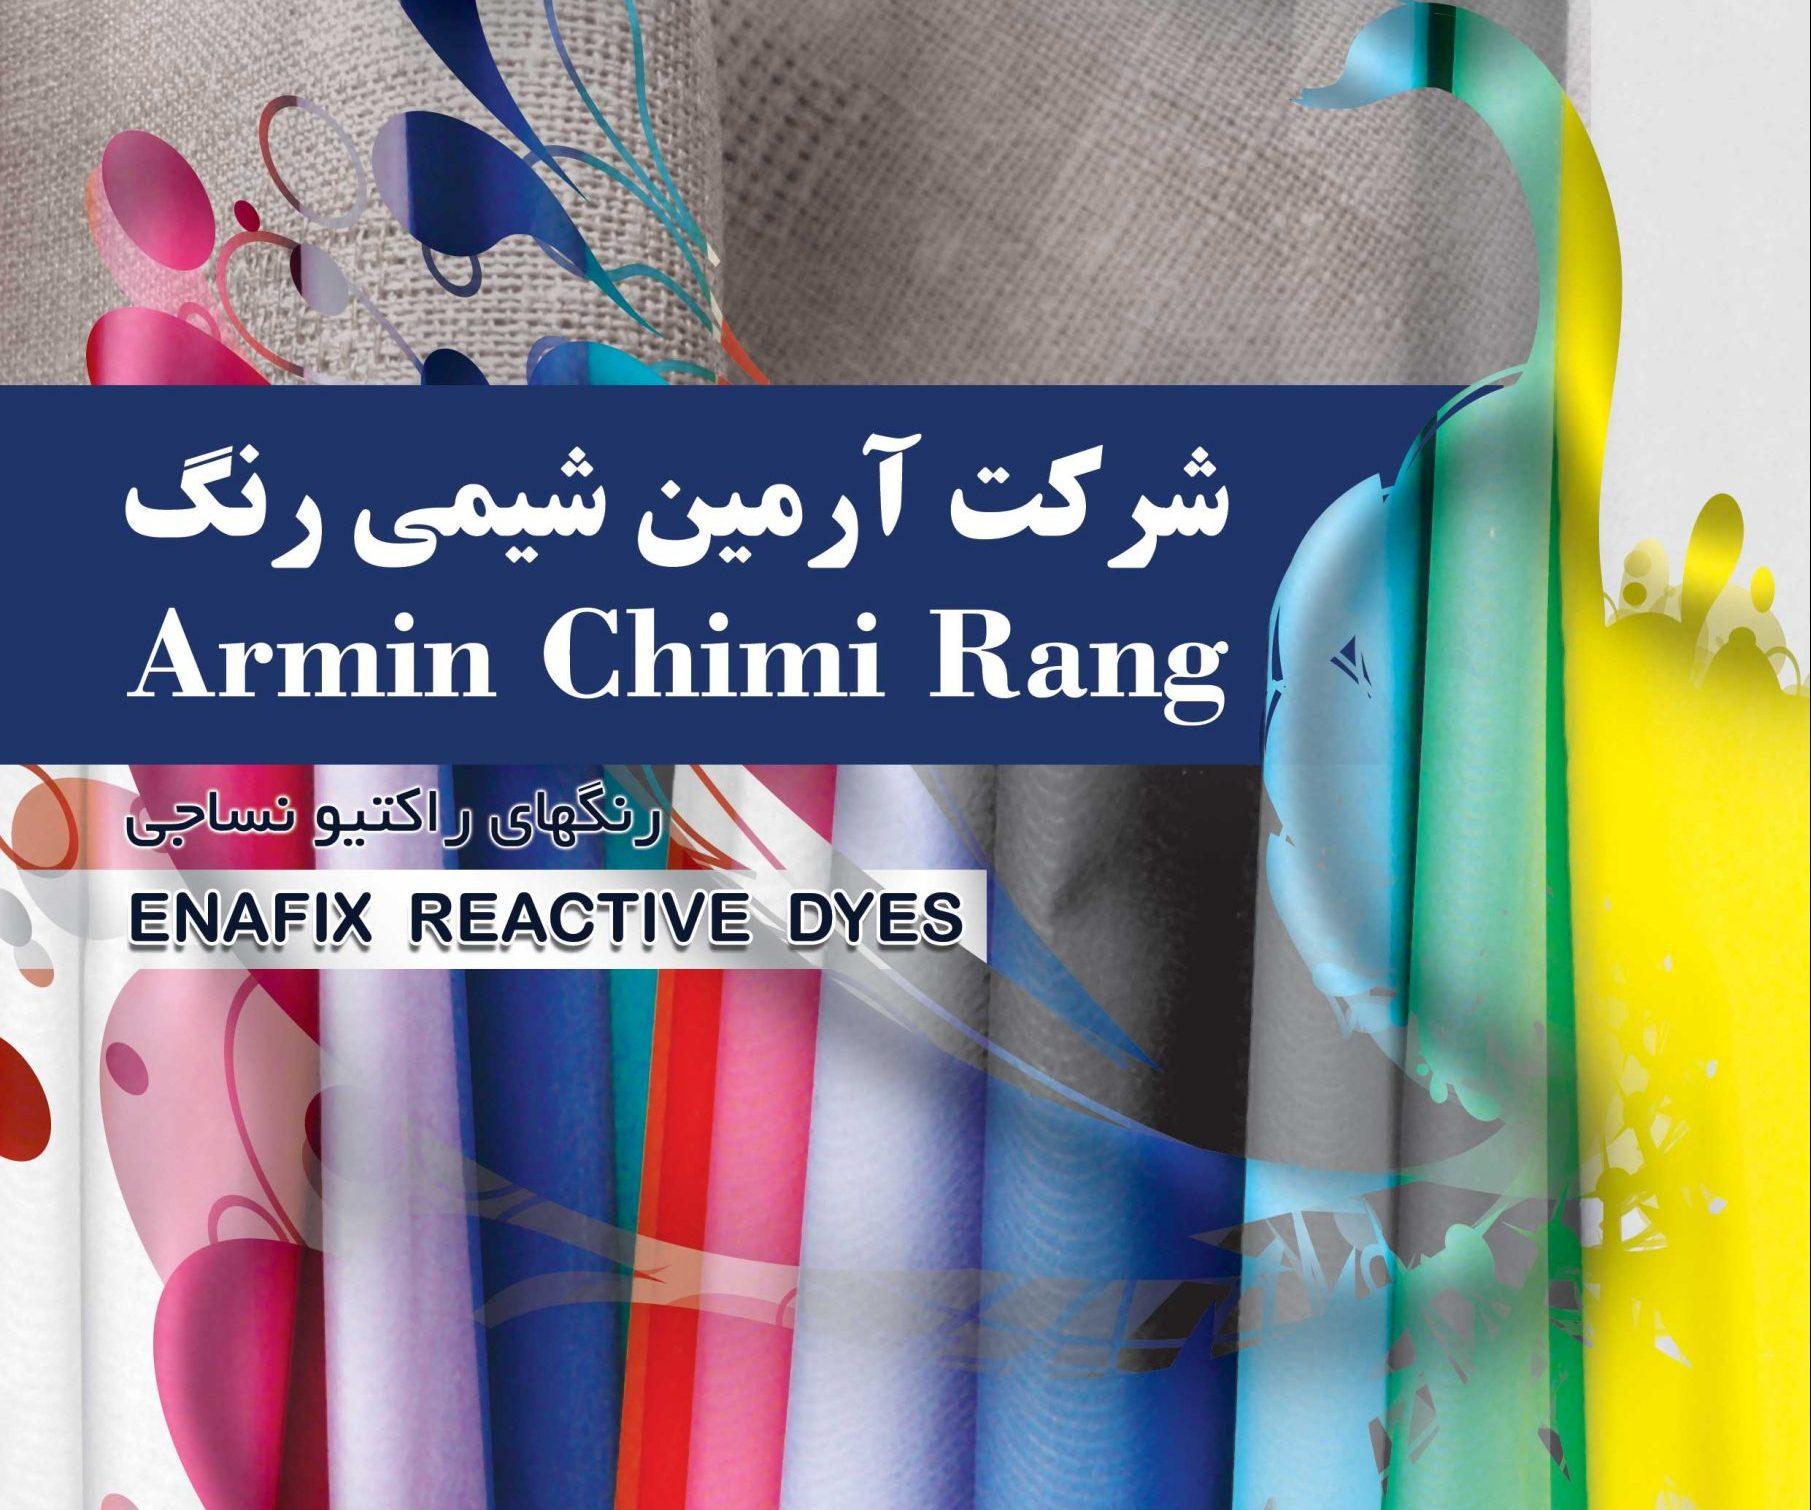 ENAFIX Reactive Dyes